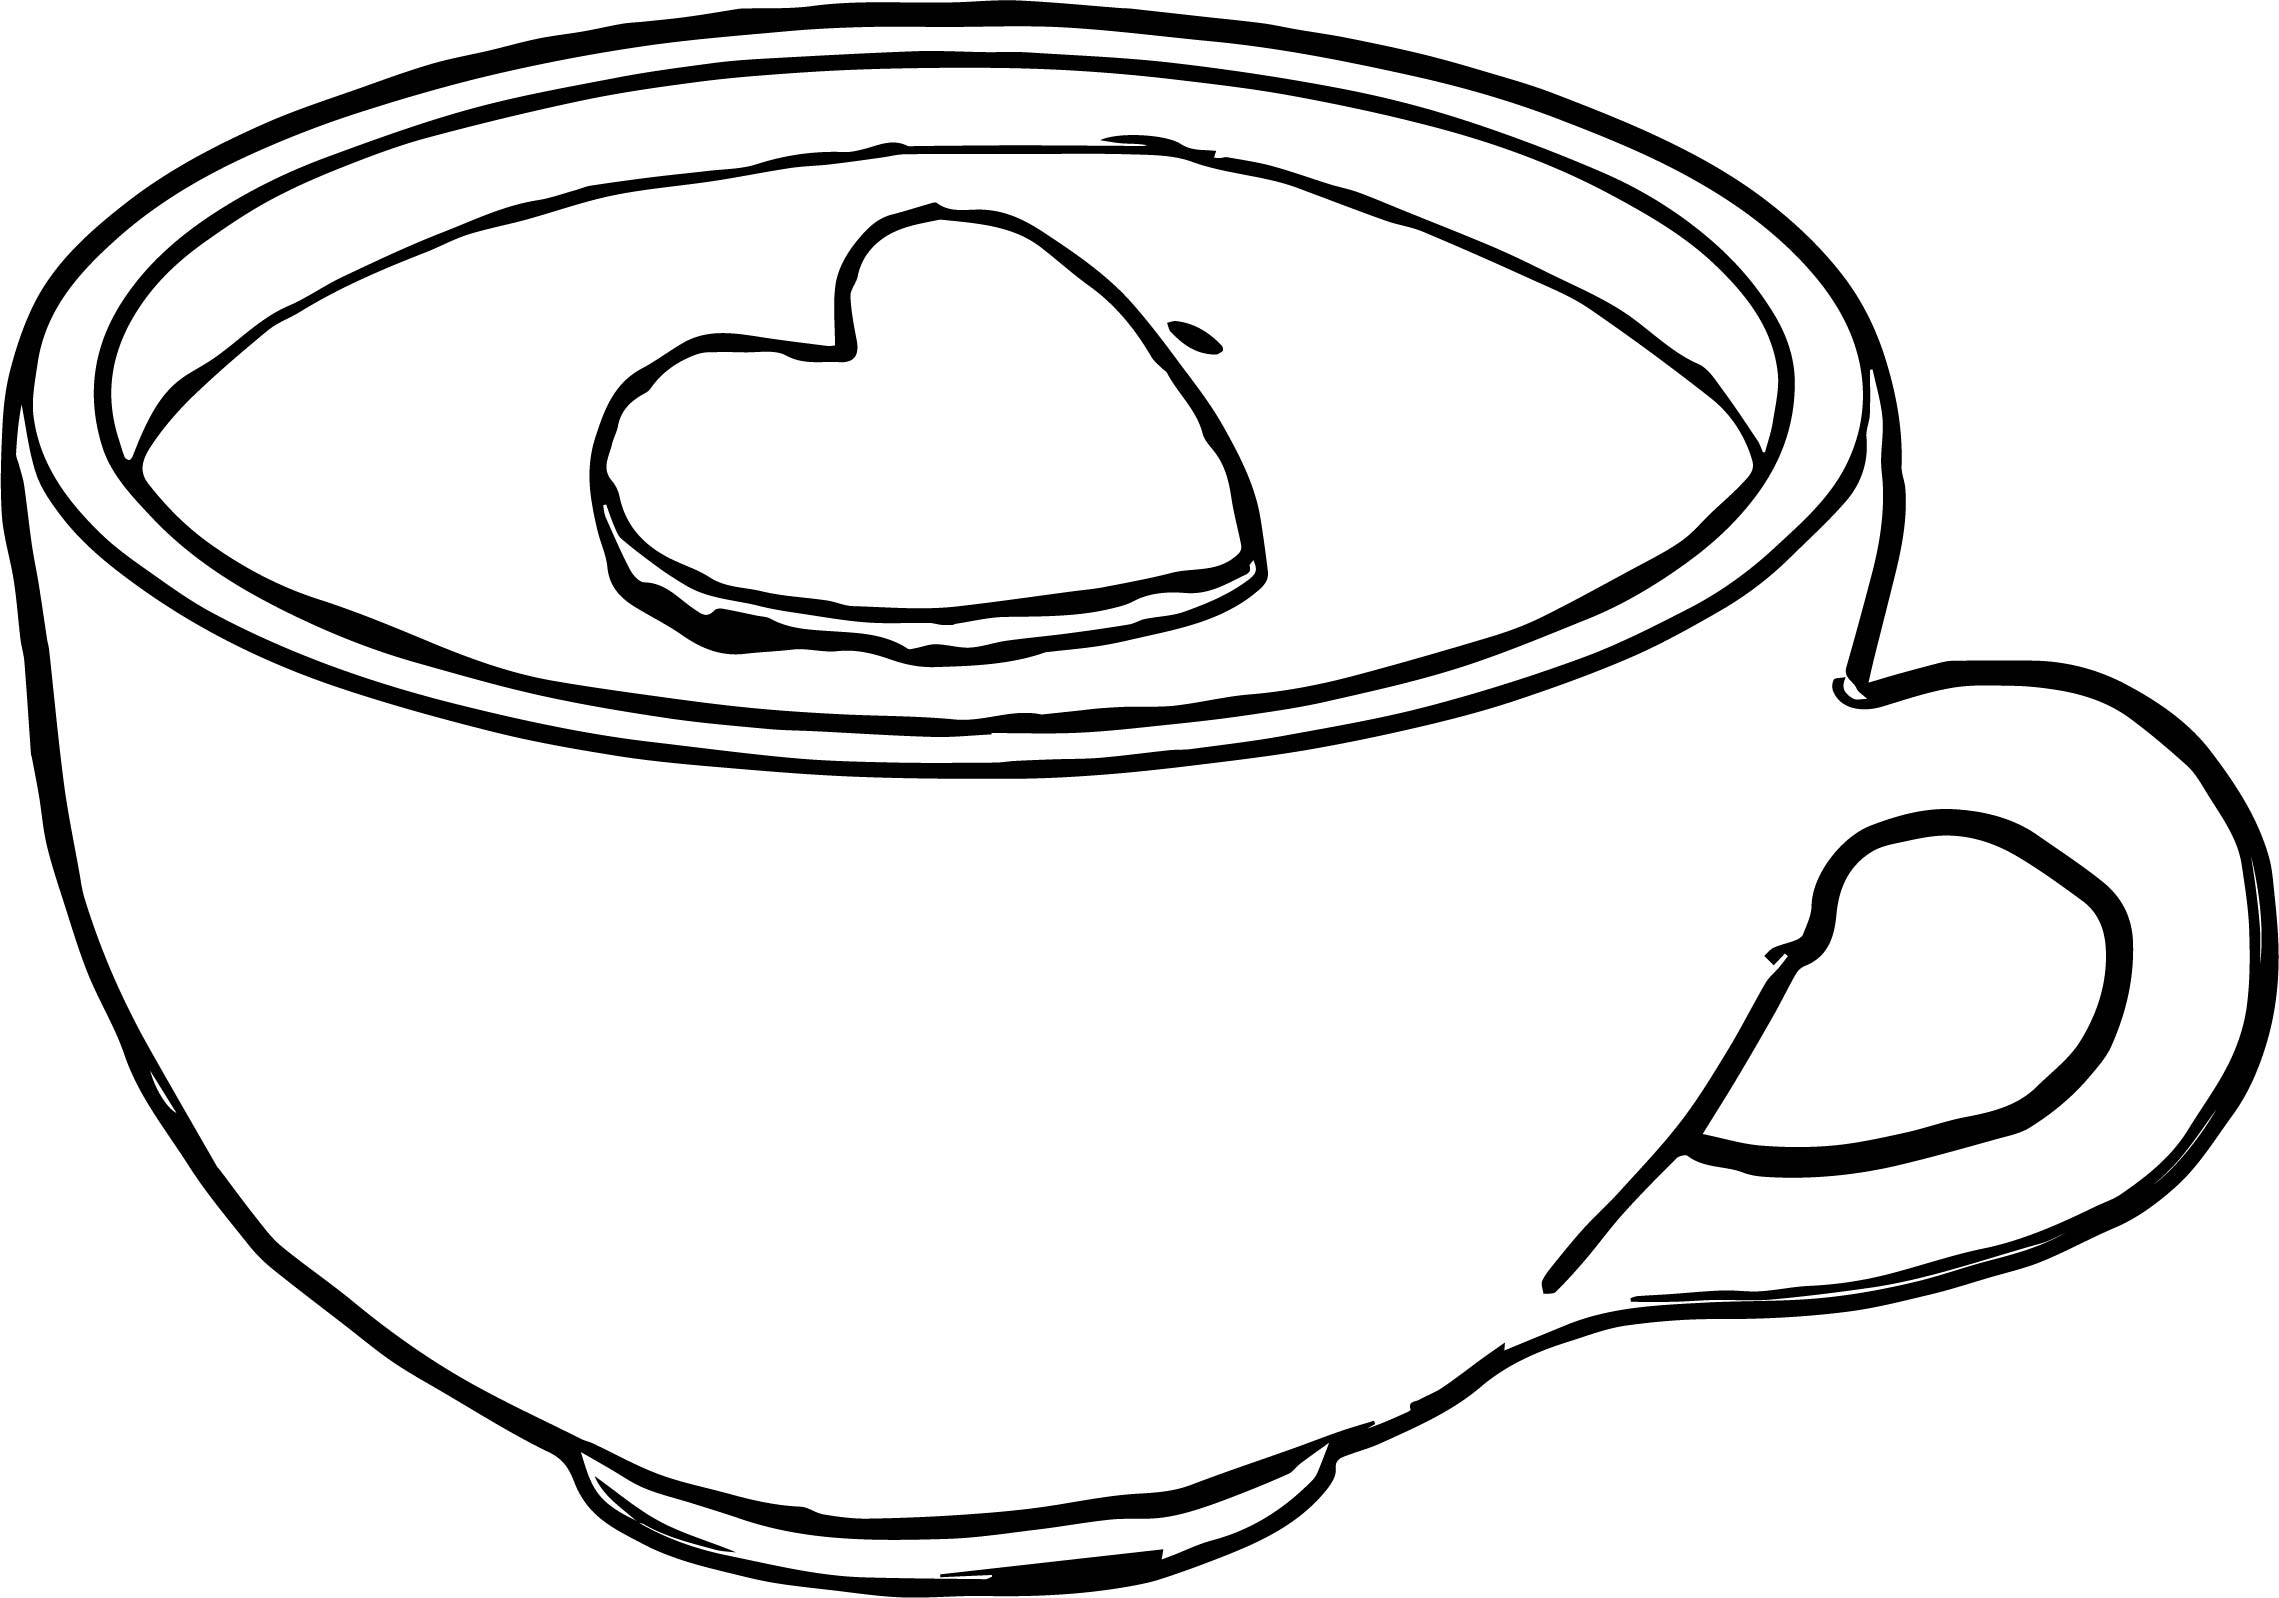 coffee mug drawing at getdrawings com free for personal use coffee